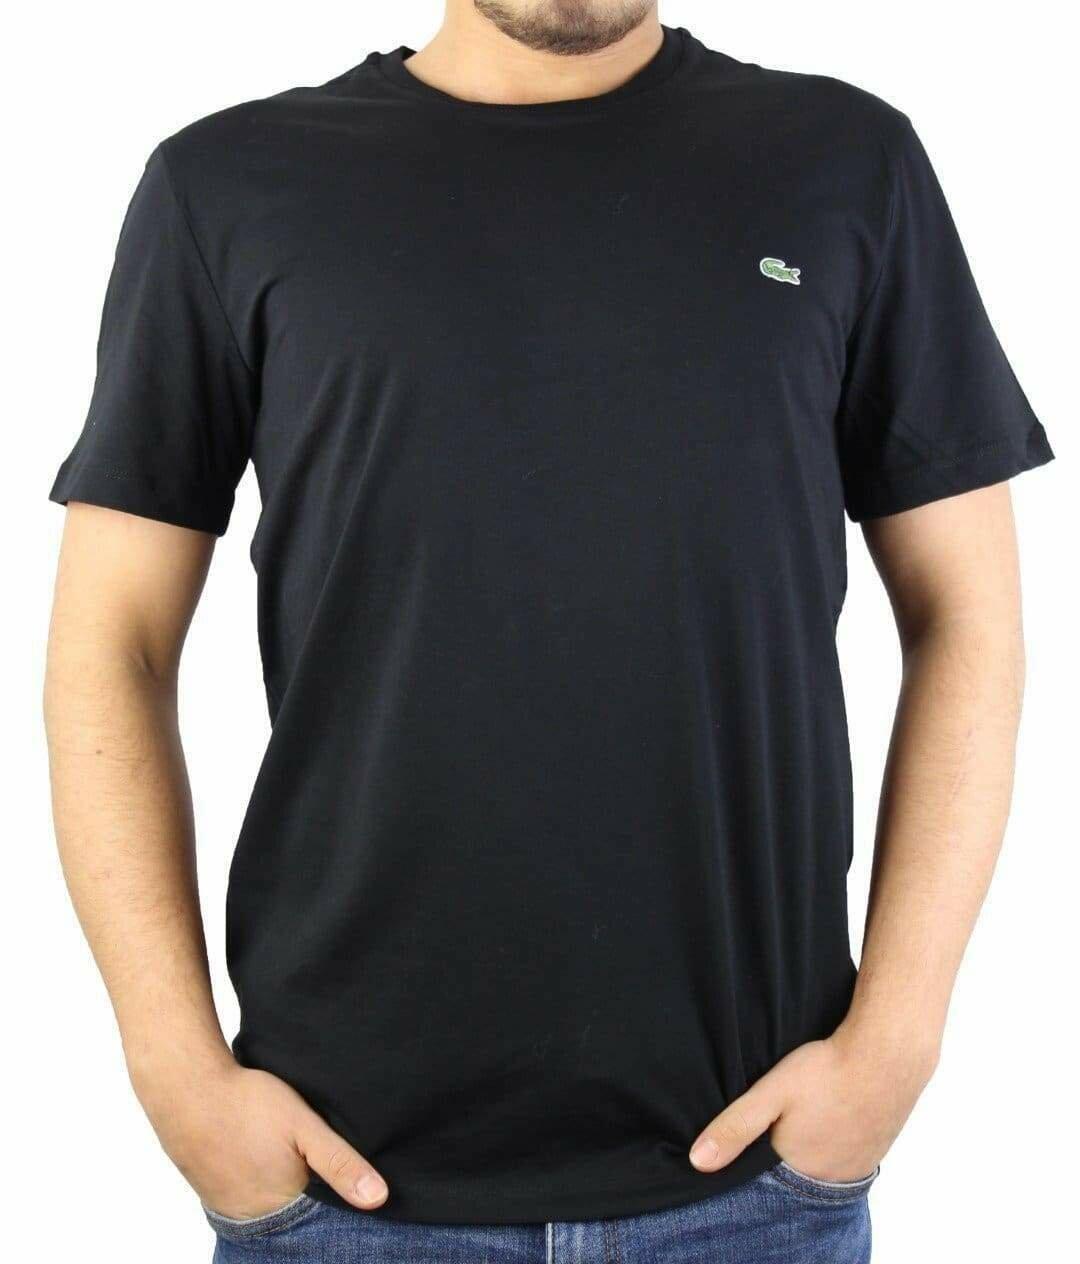 Lacoste Men's T-Shirt  Crew Neck White